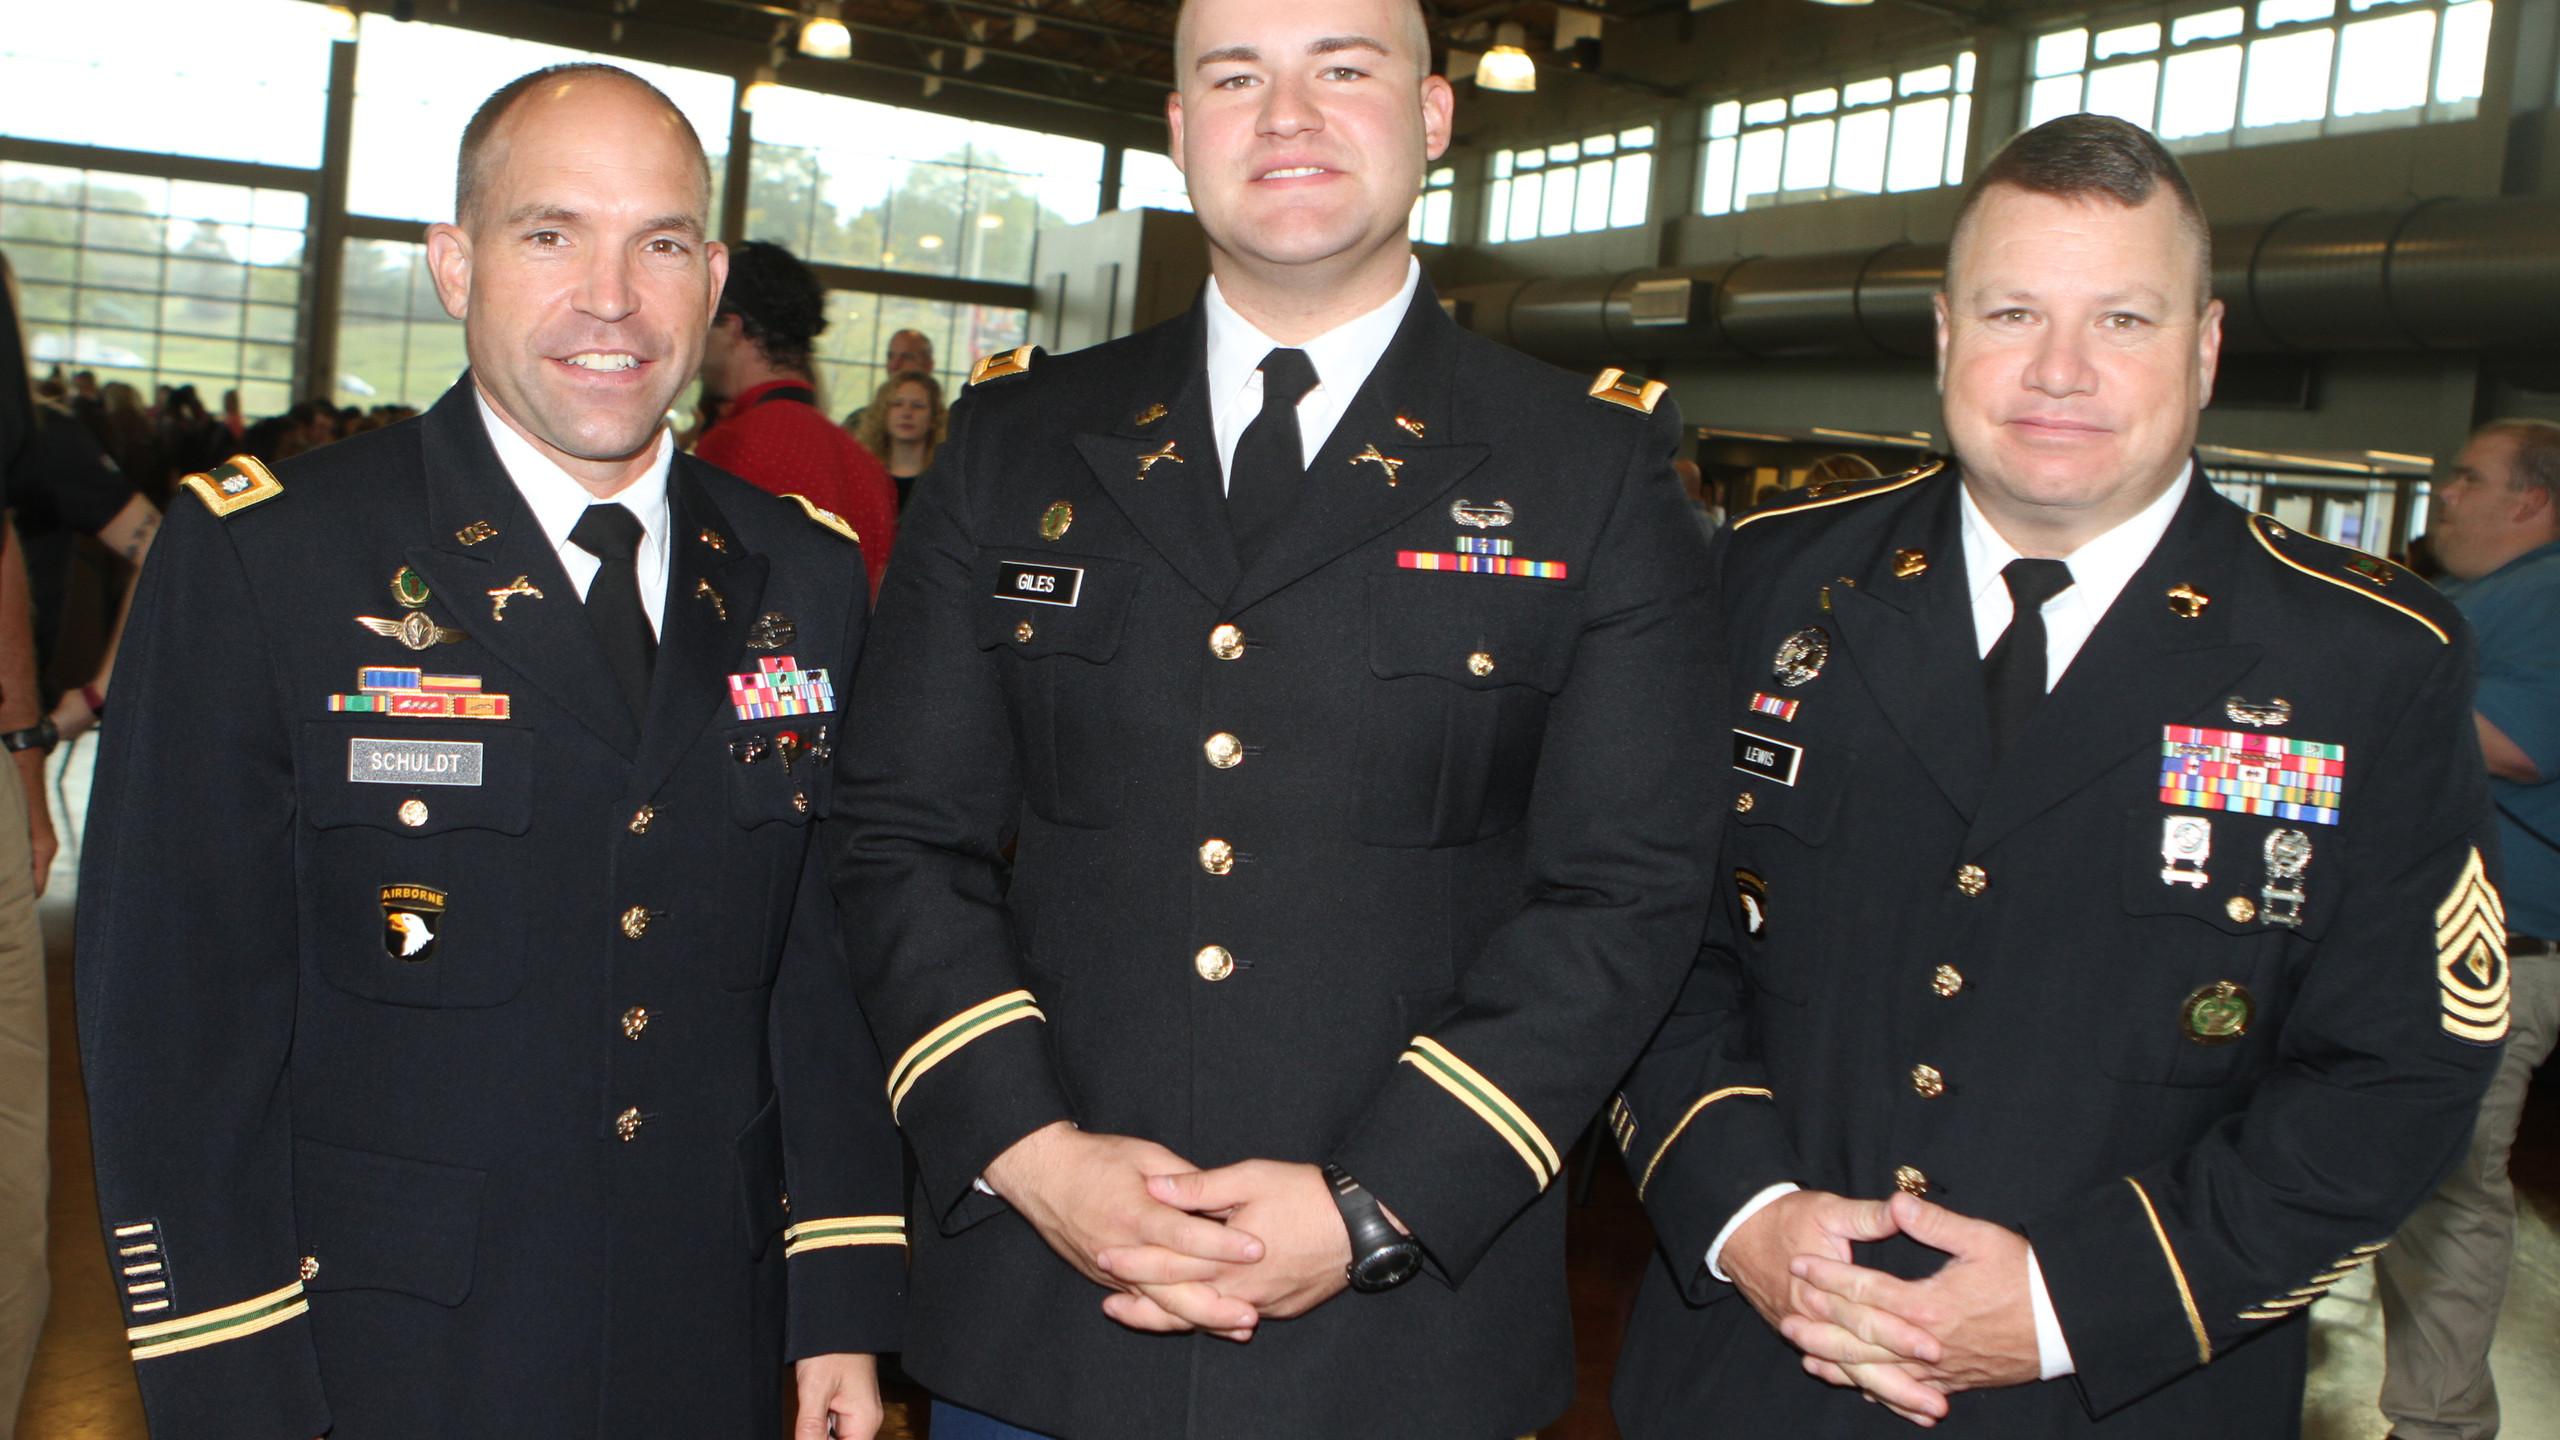 Lt. Col. Joel Schuldt, 2nd Lt